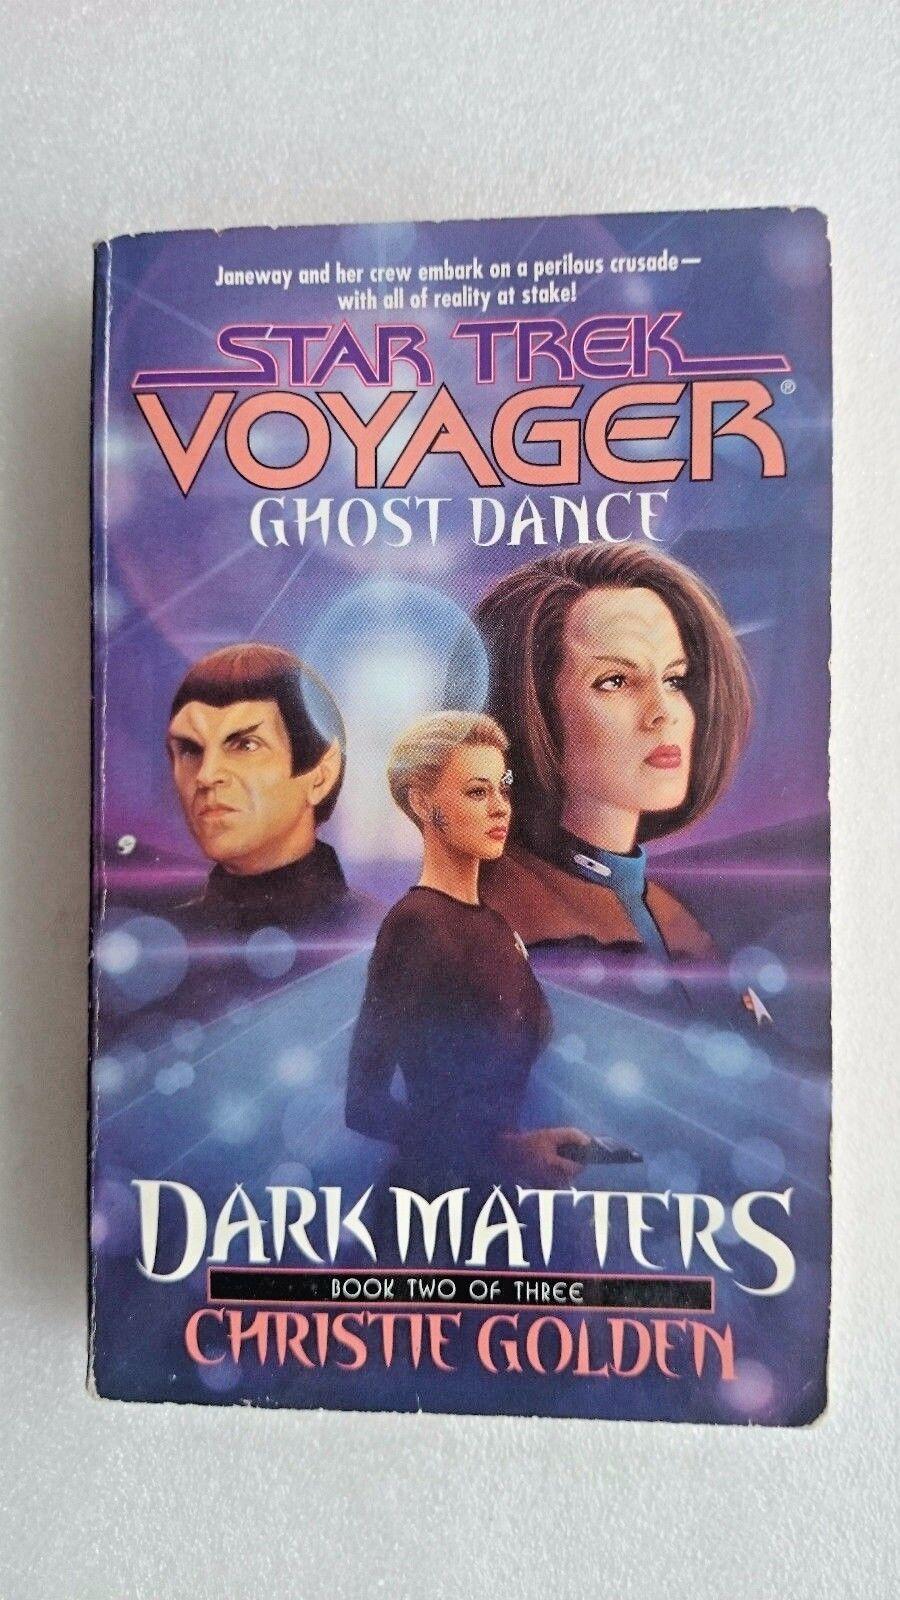 Dark Matters: Bk. 2: Ghost Dance by Christie Golden (Paperback, 2000)